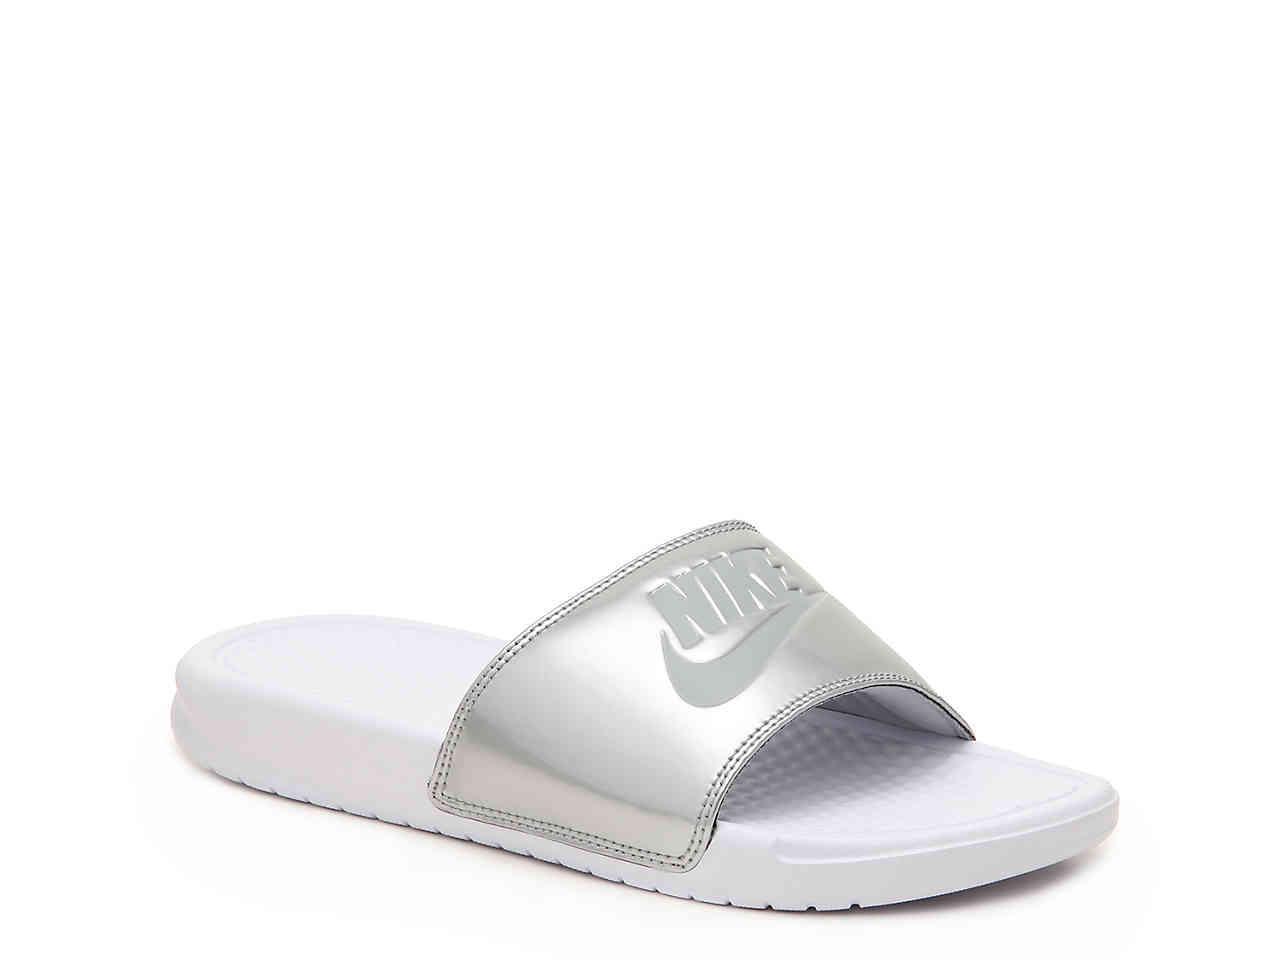 a683c49d8cfd Lyst - Nike Benassi Women s Slide Sandal in Metallic - Save 3%